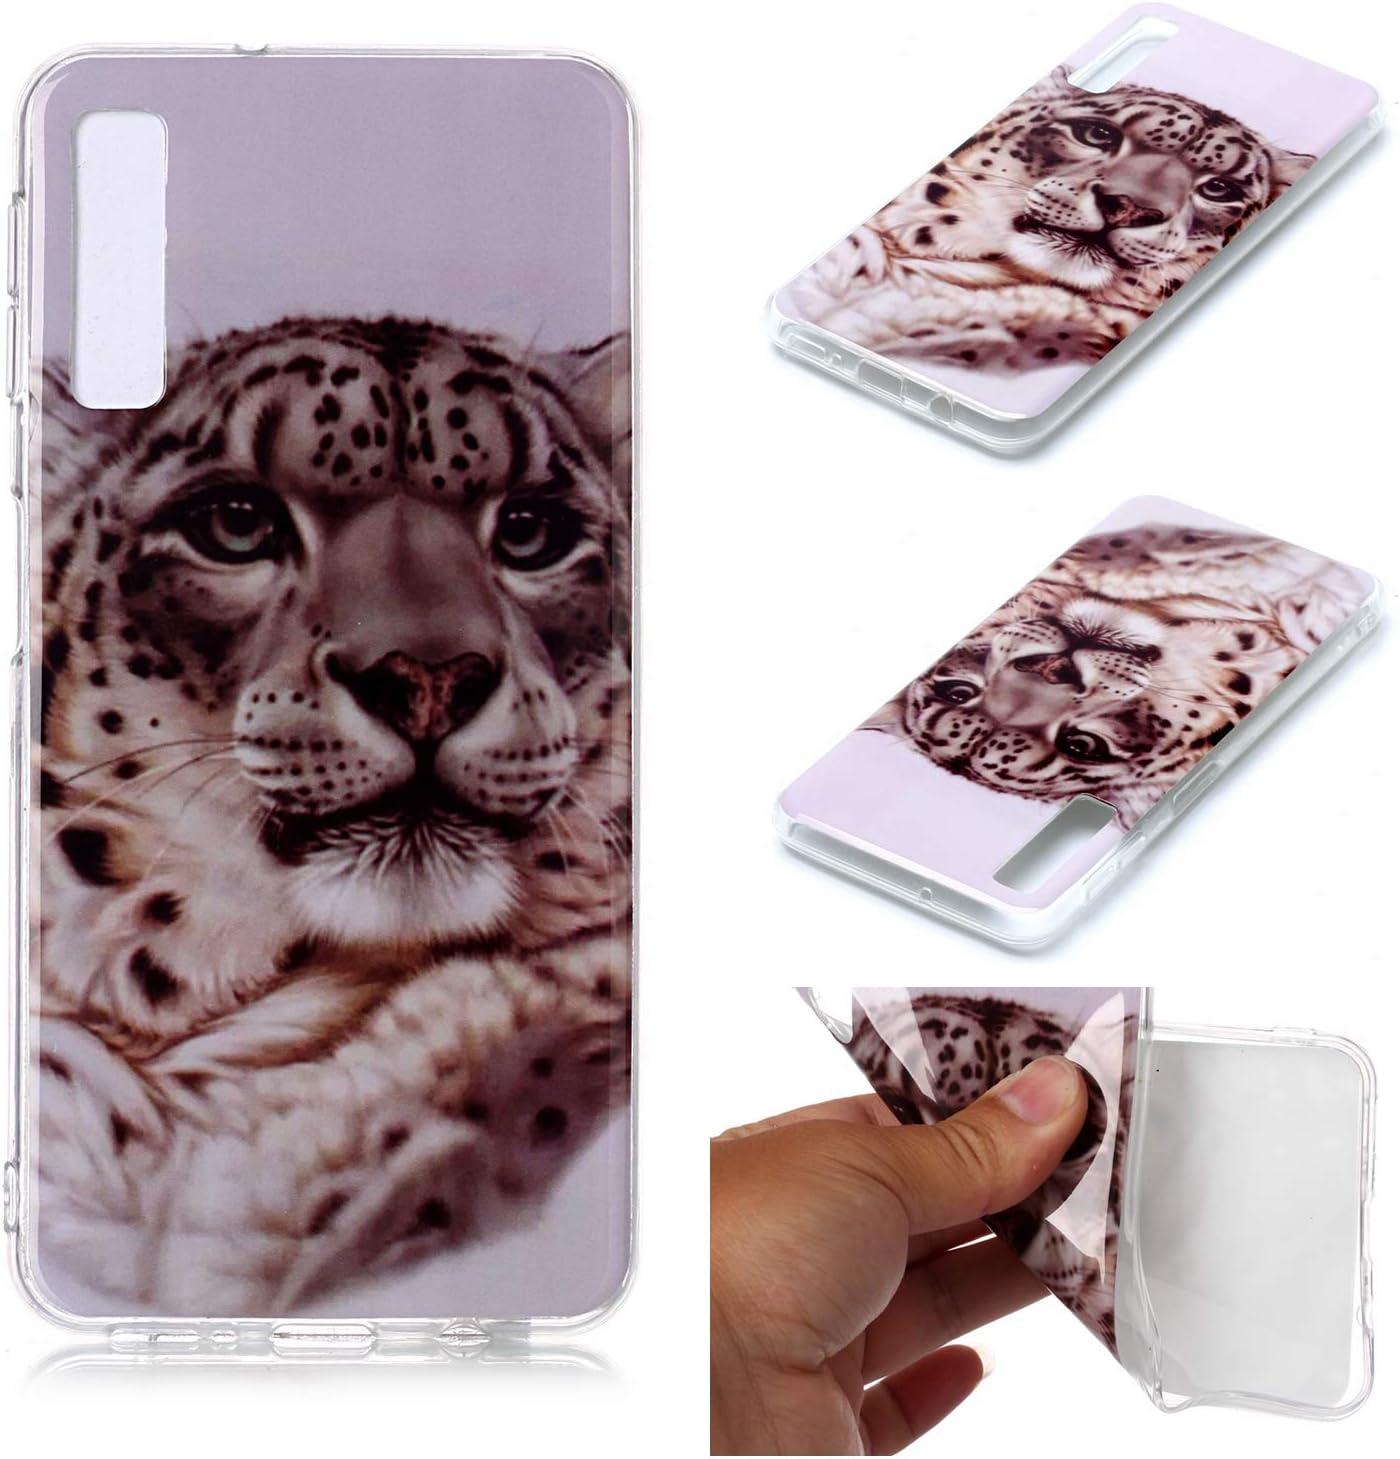 WIWJ Kompatibel mit Samsung Galaxy A7 2018 H/ülle Crystal Wei/ß Transparent Panzerglas Handyh/ülle Ultra Thin Clear TPU Silikon Schutzh/ülle 360 Sto/ßfest Tasche Handy Case-Tiger